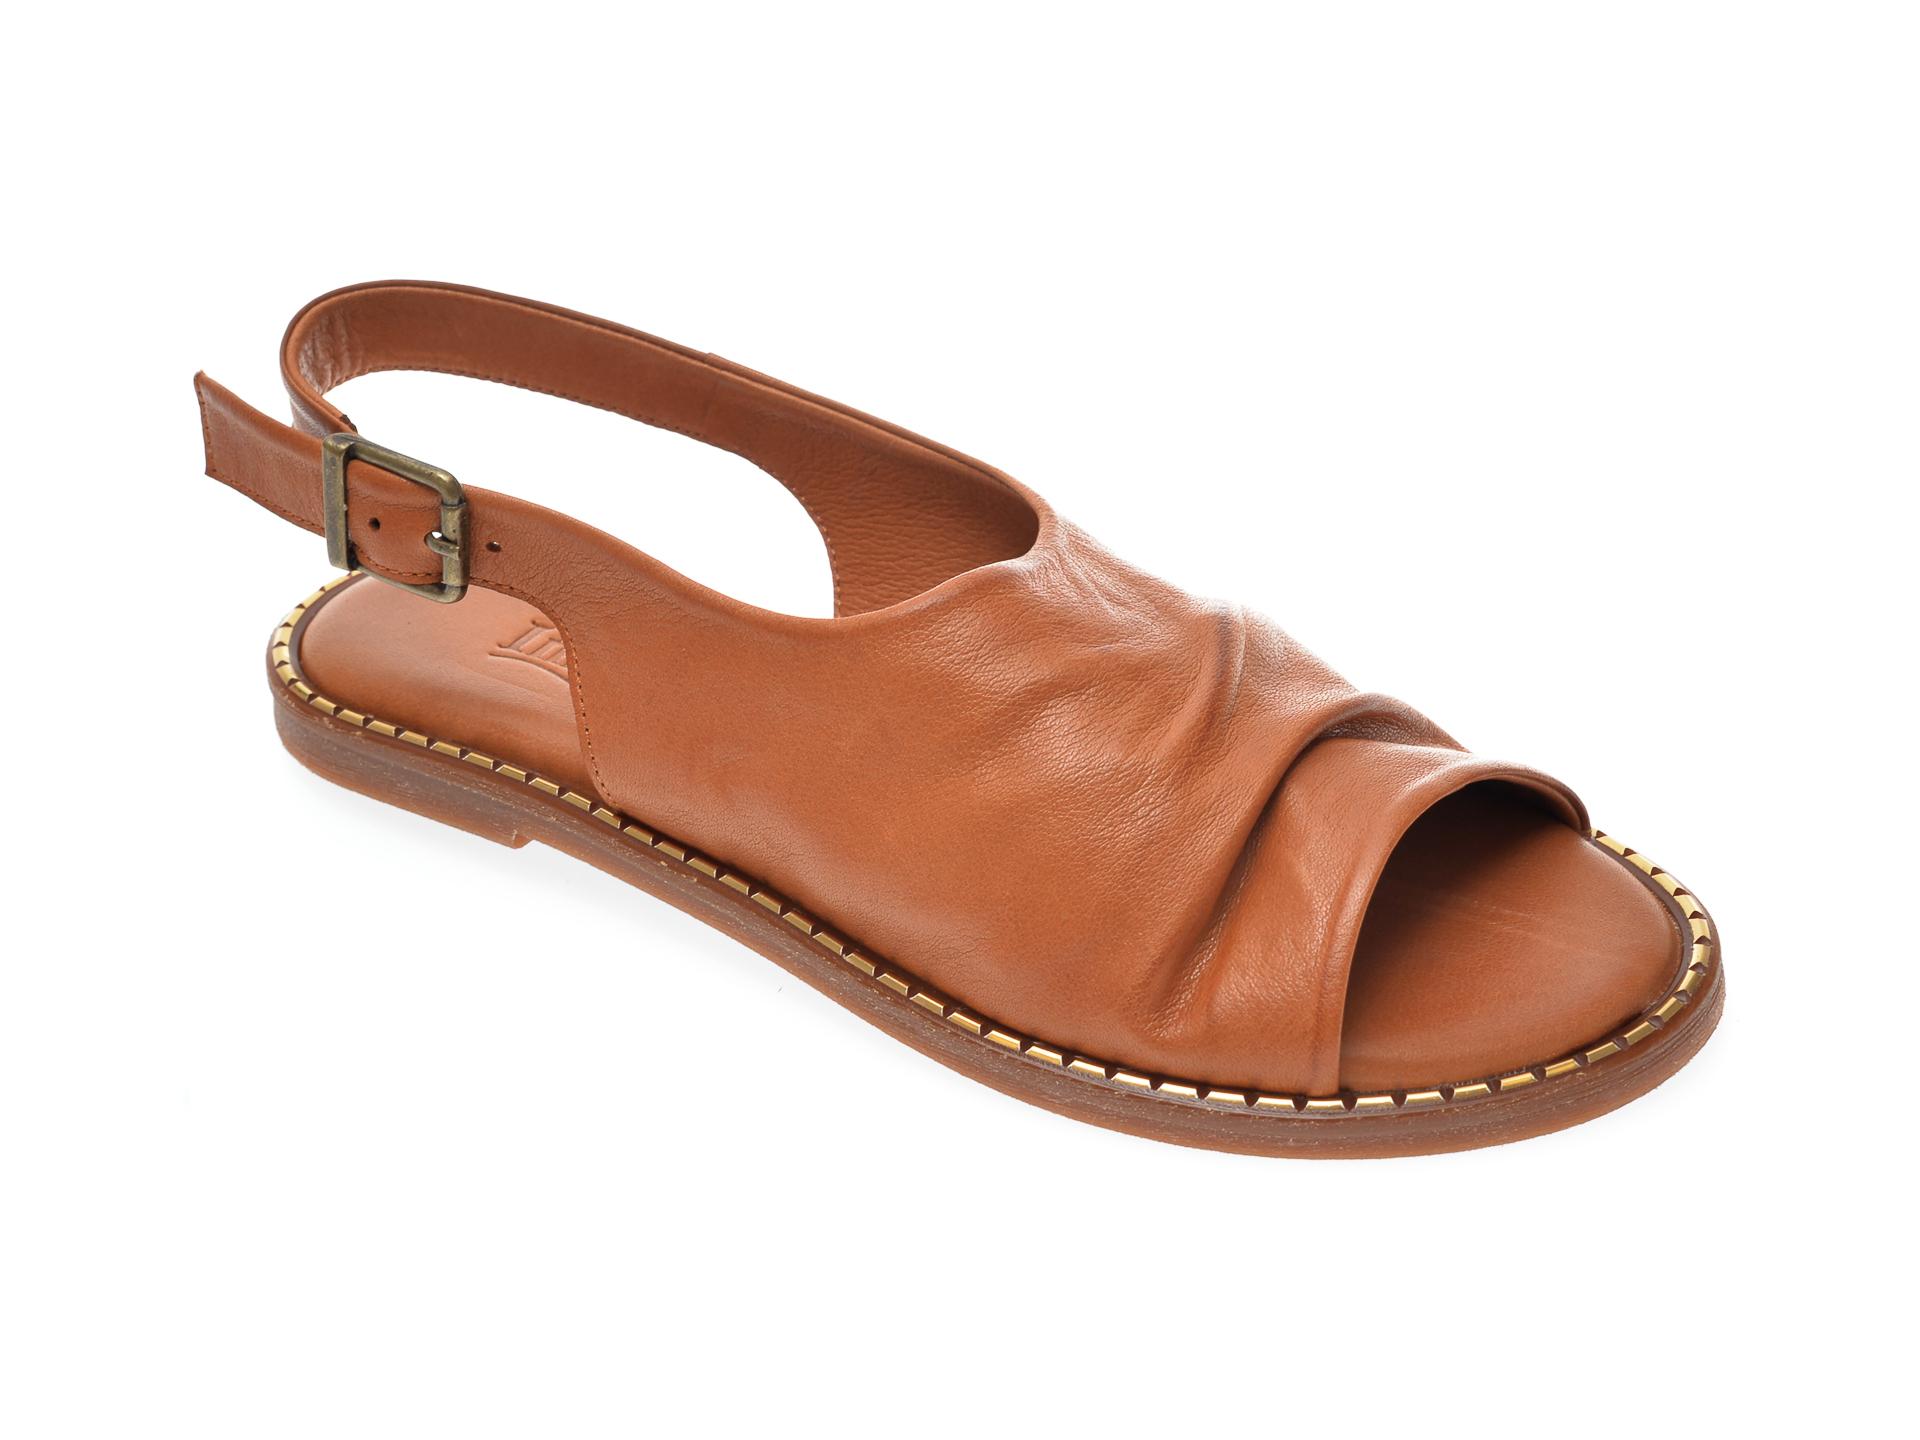 Sandale IMAGE maro, 707, din piele naturala imagine otter.ro 2021